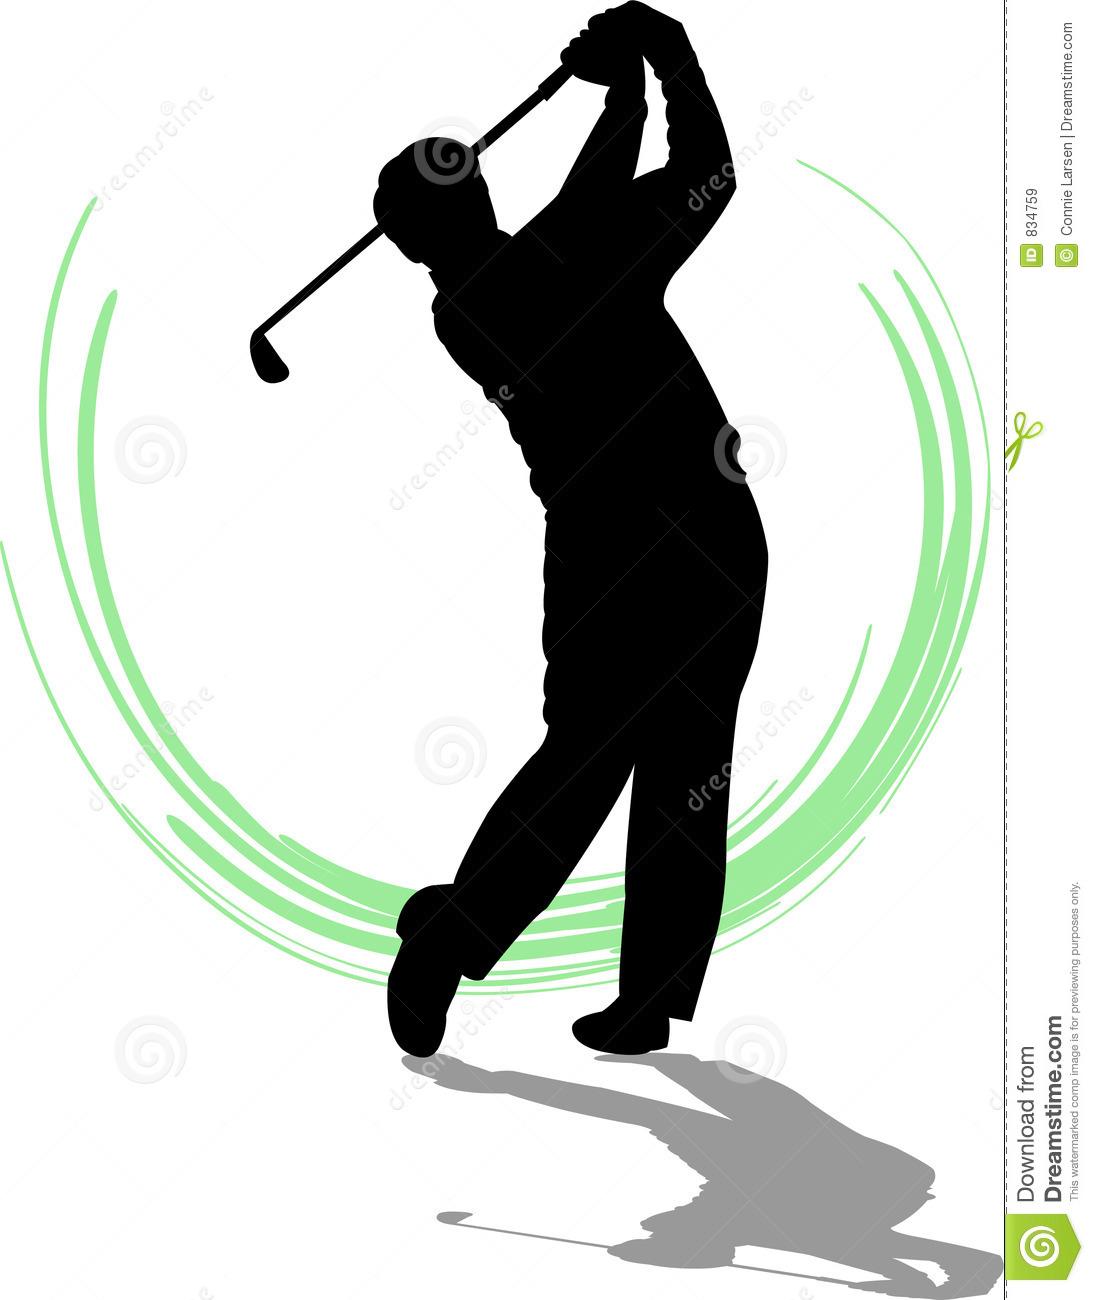 Golfing clipart male golfer. Golf club silhouette free